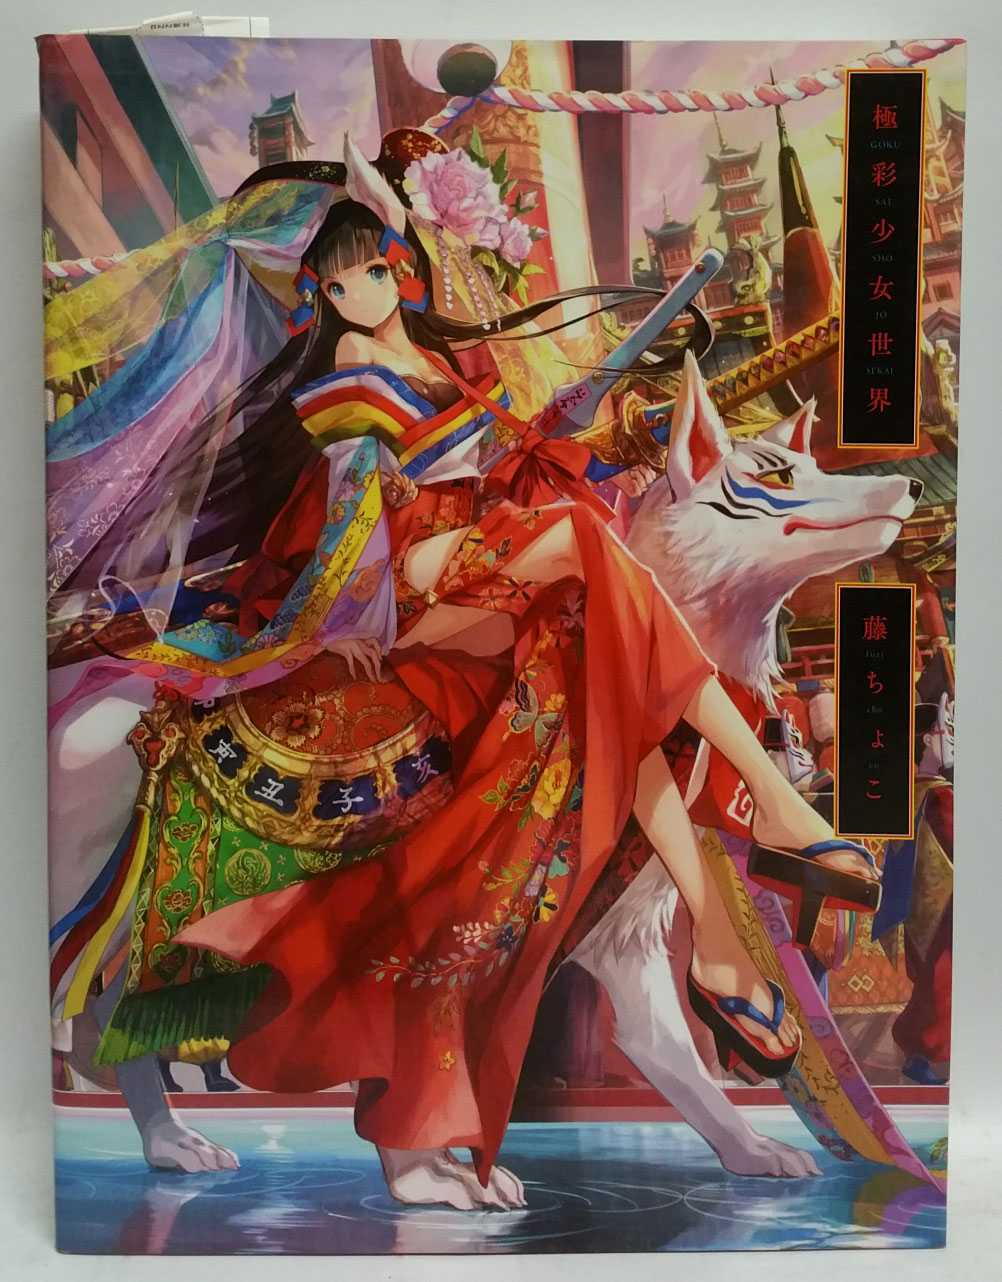 Fuzichoco Artbook: The World of Gokusai Girl, Fuzichoco